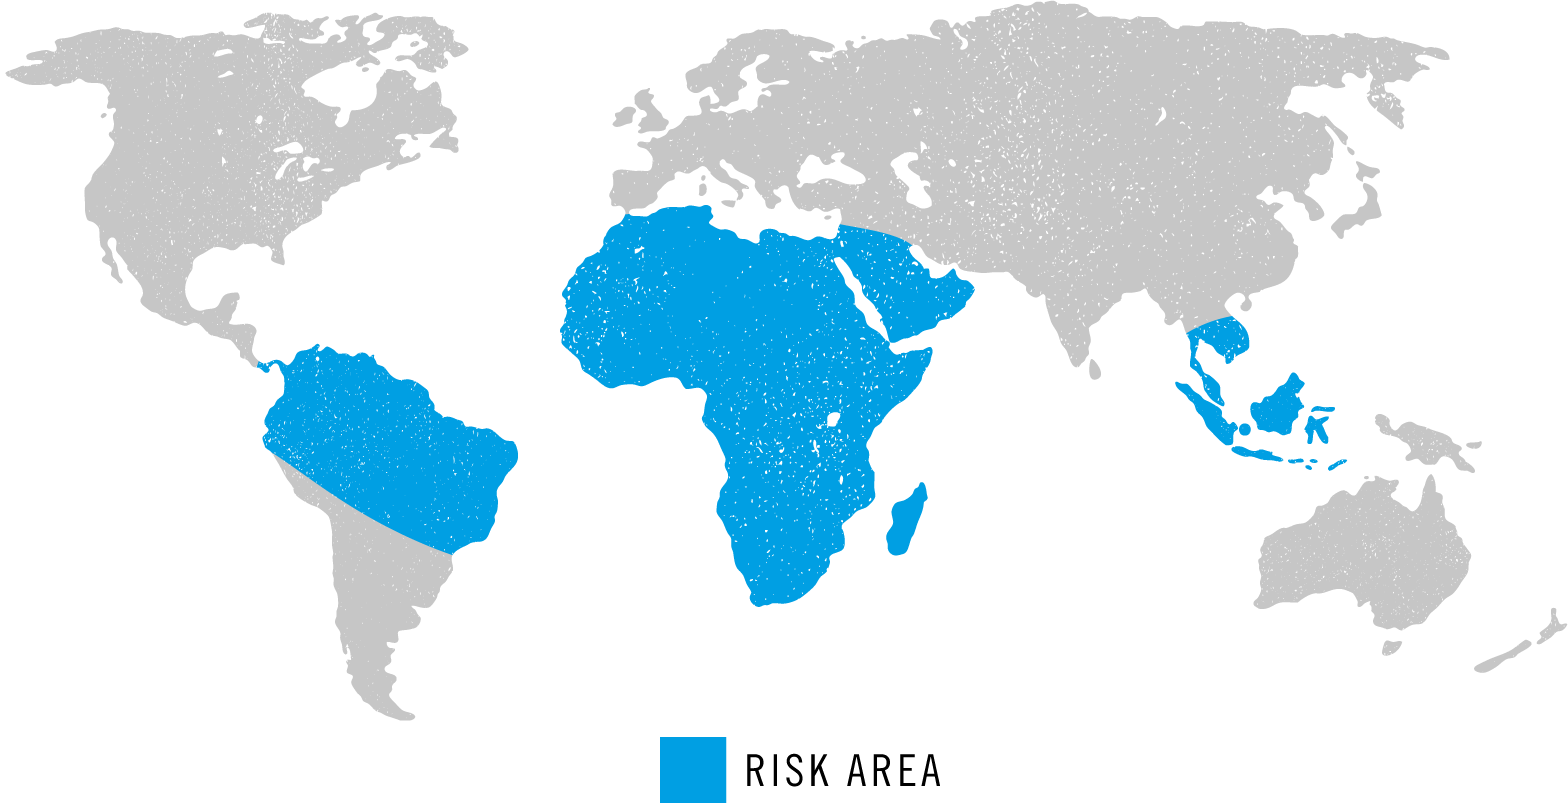 schistosomiasis uk hová menjünk a paraziták kezelésére